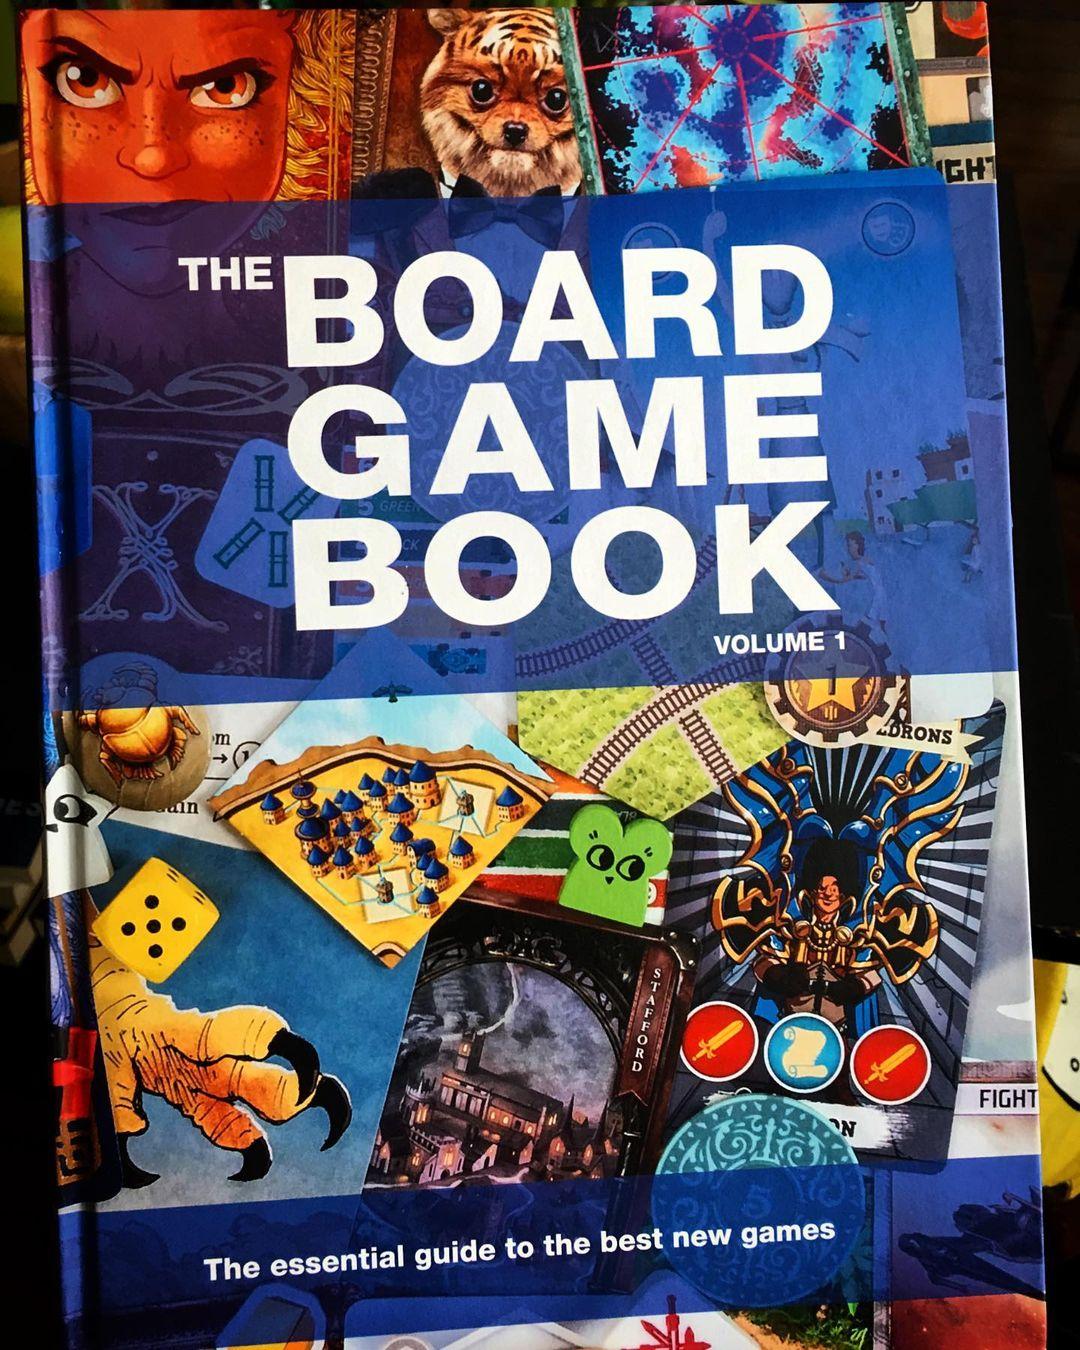 the board game book volume 2